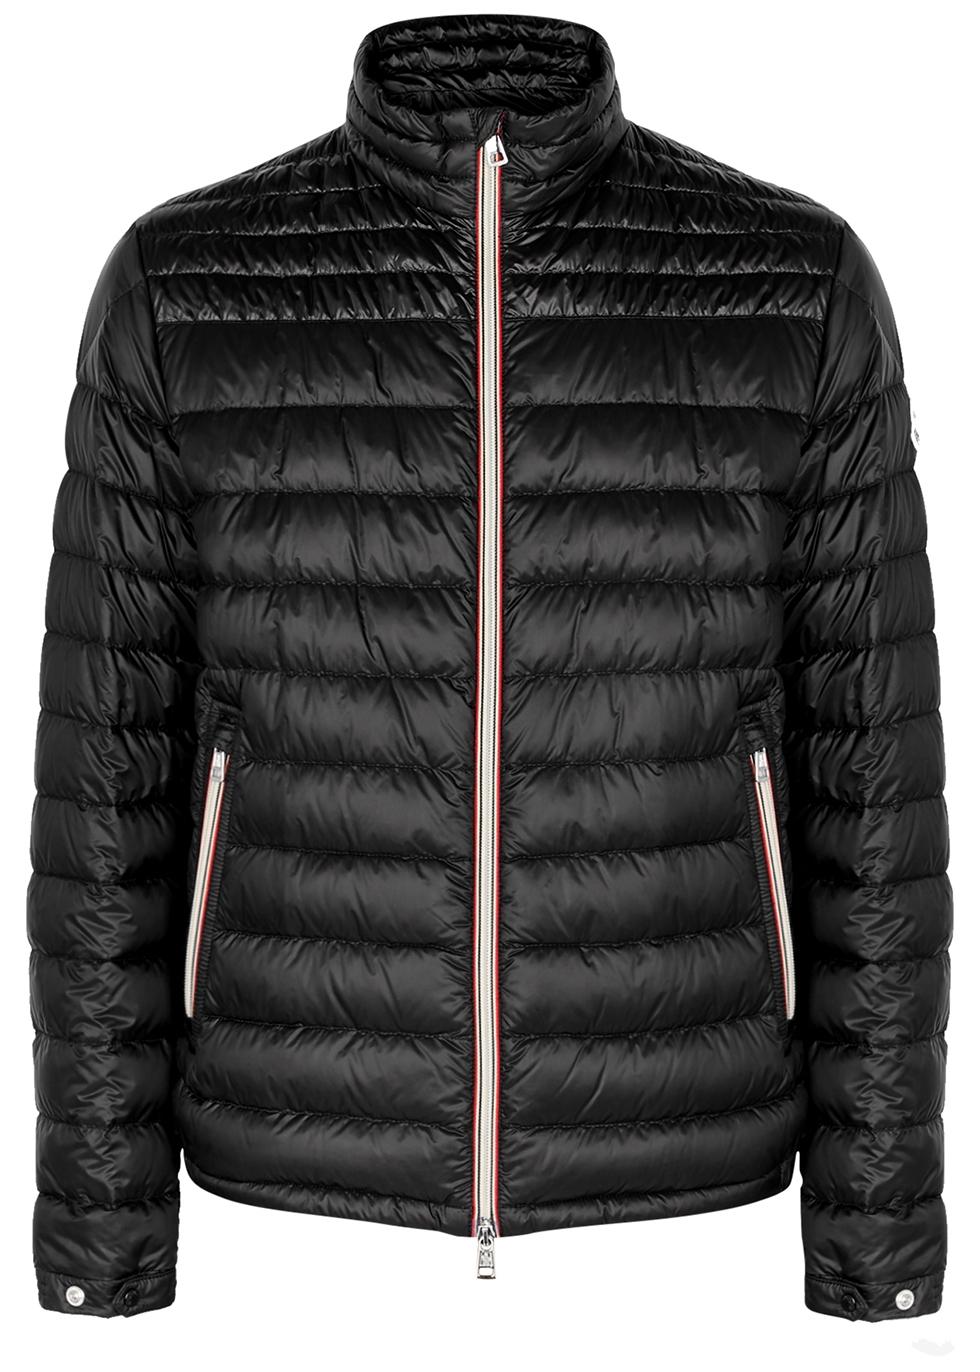 Moncler Designer Jackets Coats Gilets Harvey Nichols